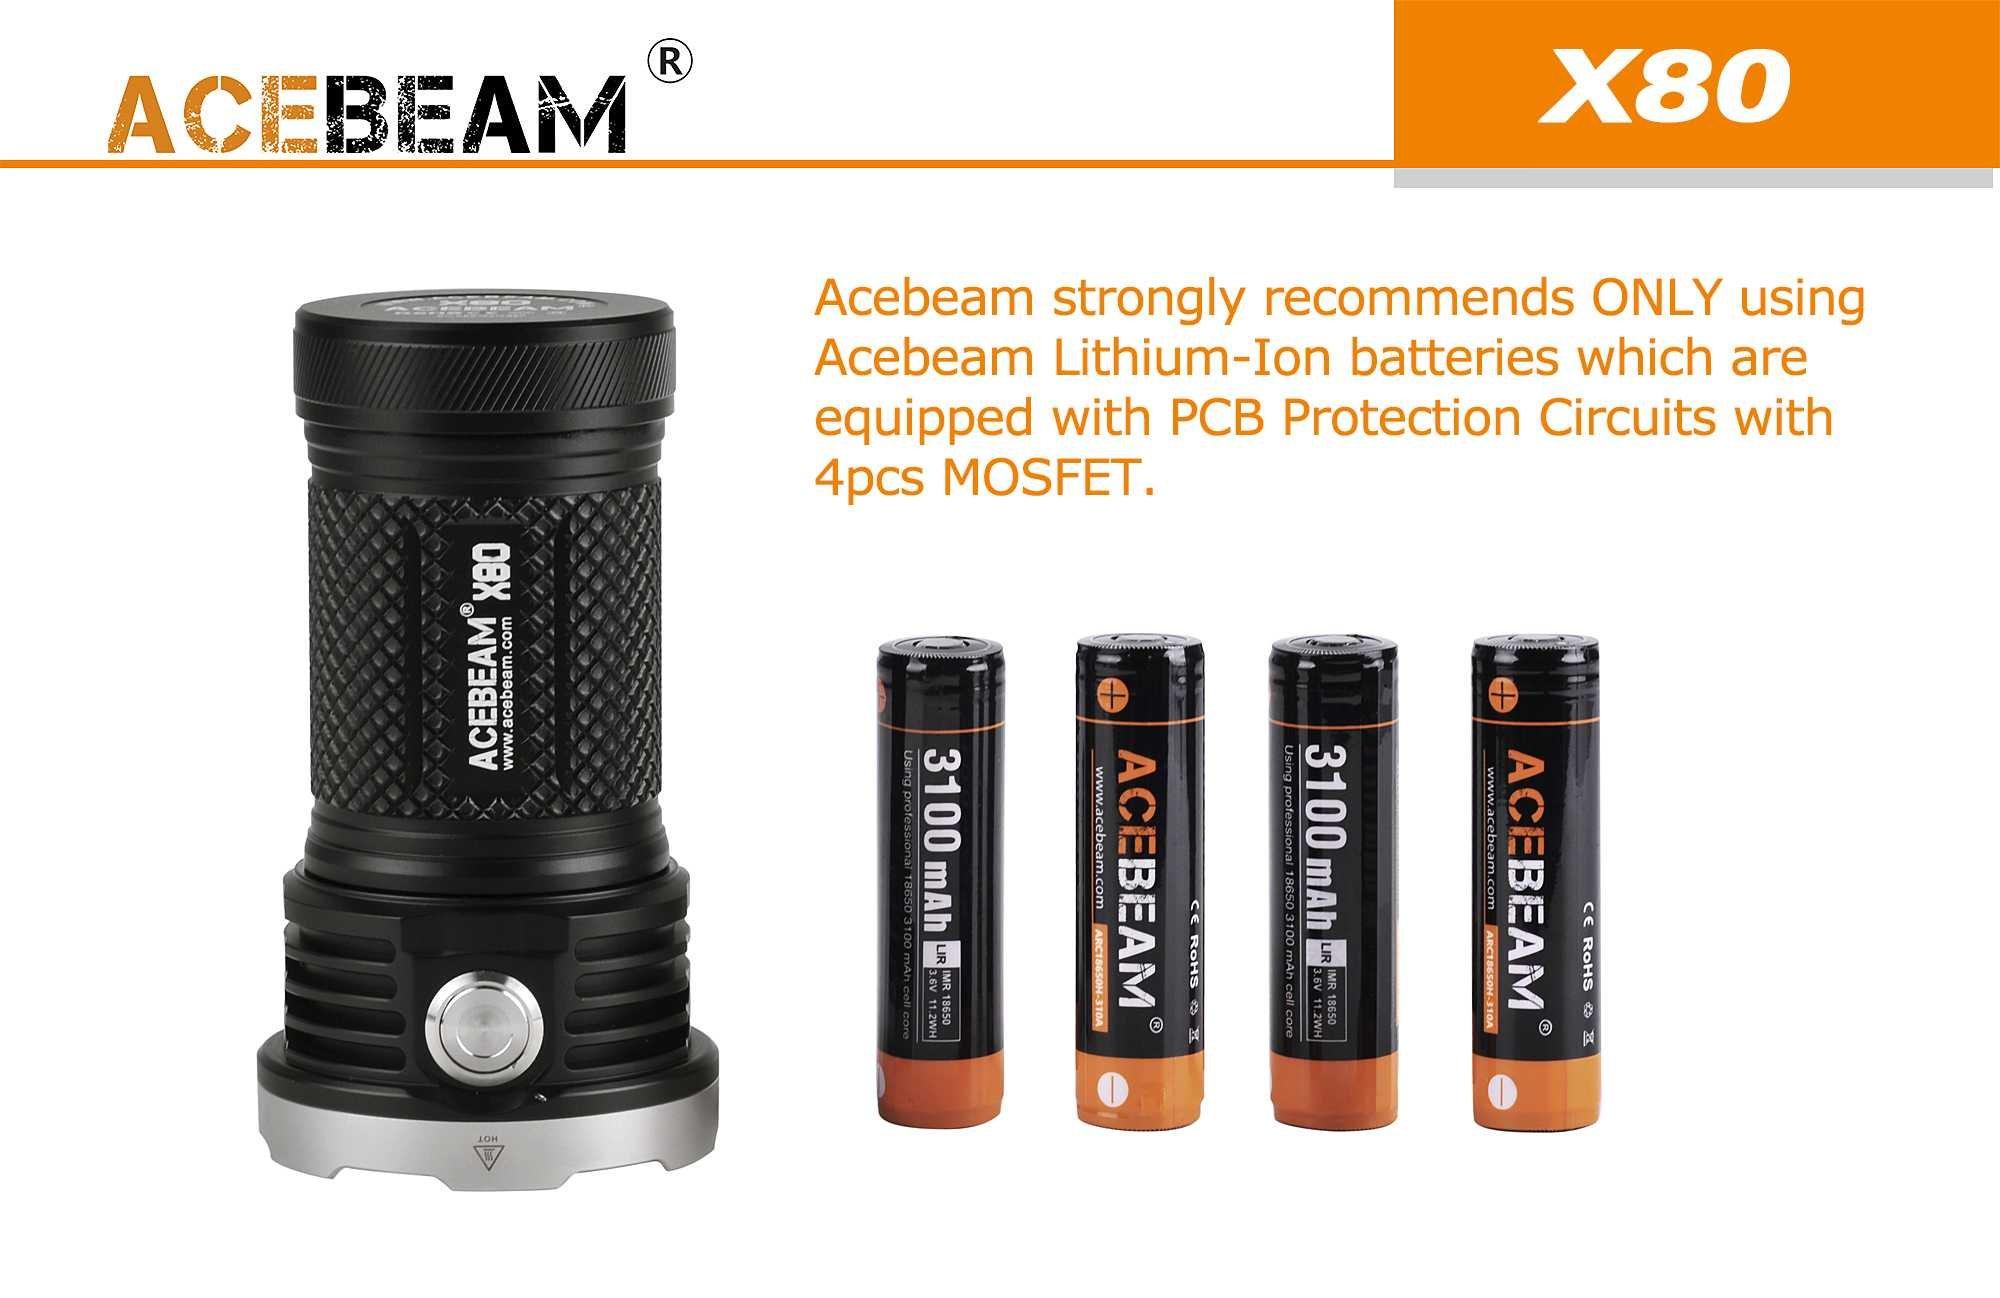 ACEBEAM X80 LED Flashlight 12x Cree XHP50.2 25000 Lumens 5-color Light Beam Flashlights Included 4 3100mah Batteries by Acebeam (Image #7)